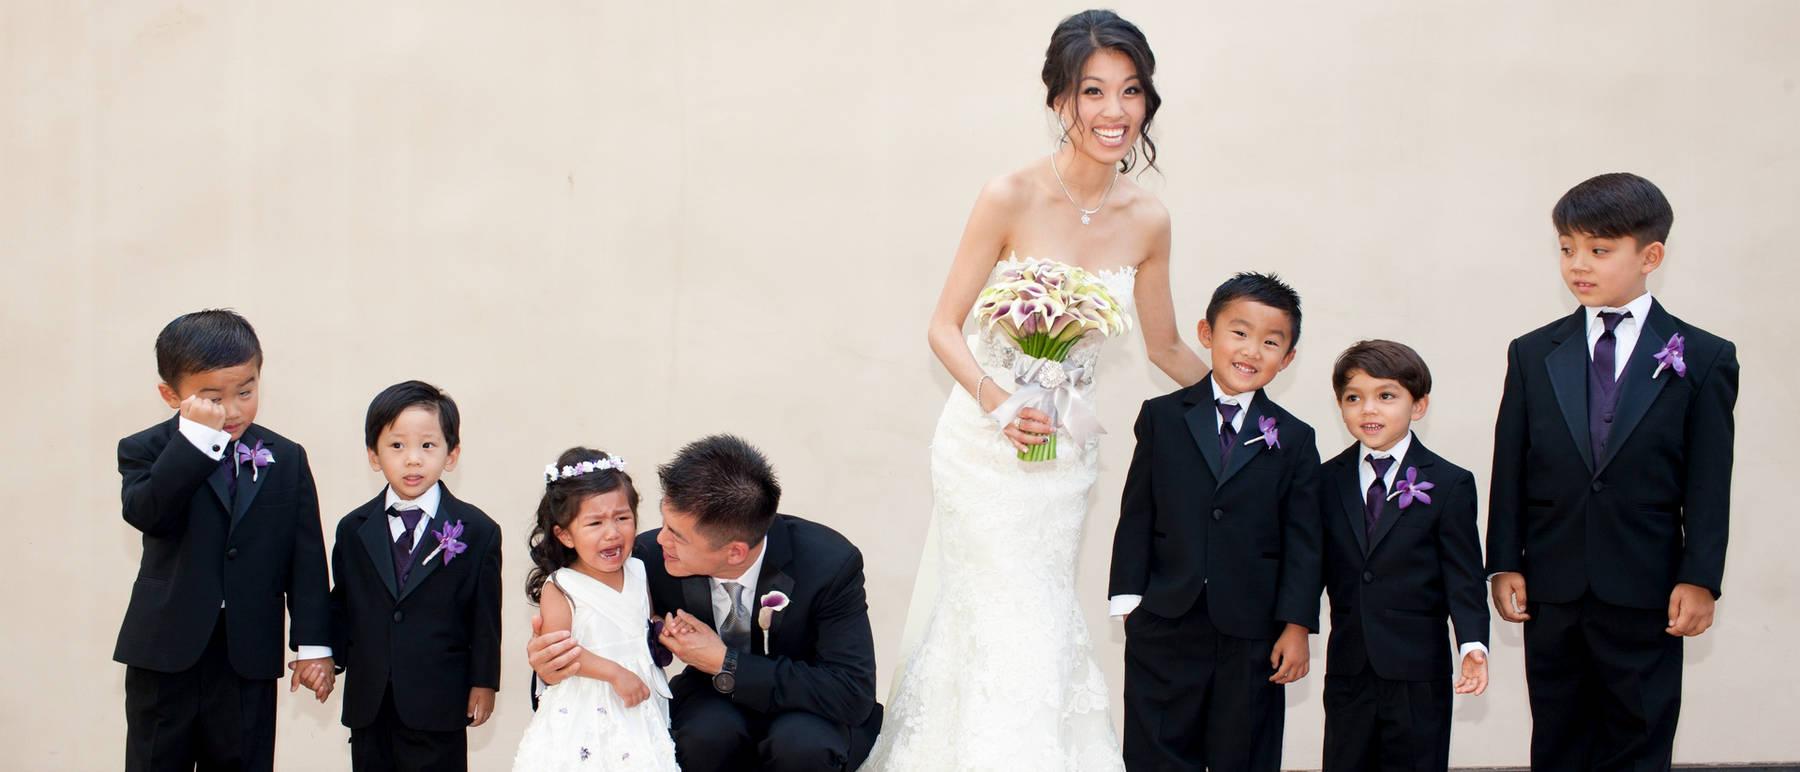 johnandjoseph-wedding-photographer-hz-slider-305